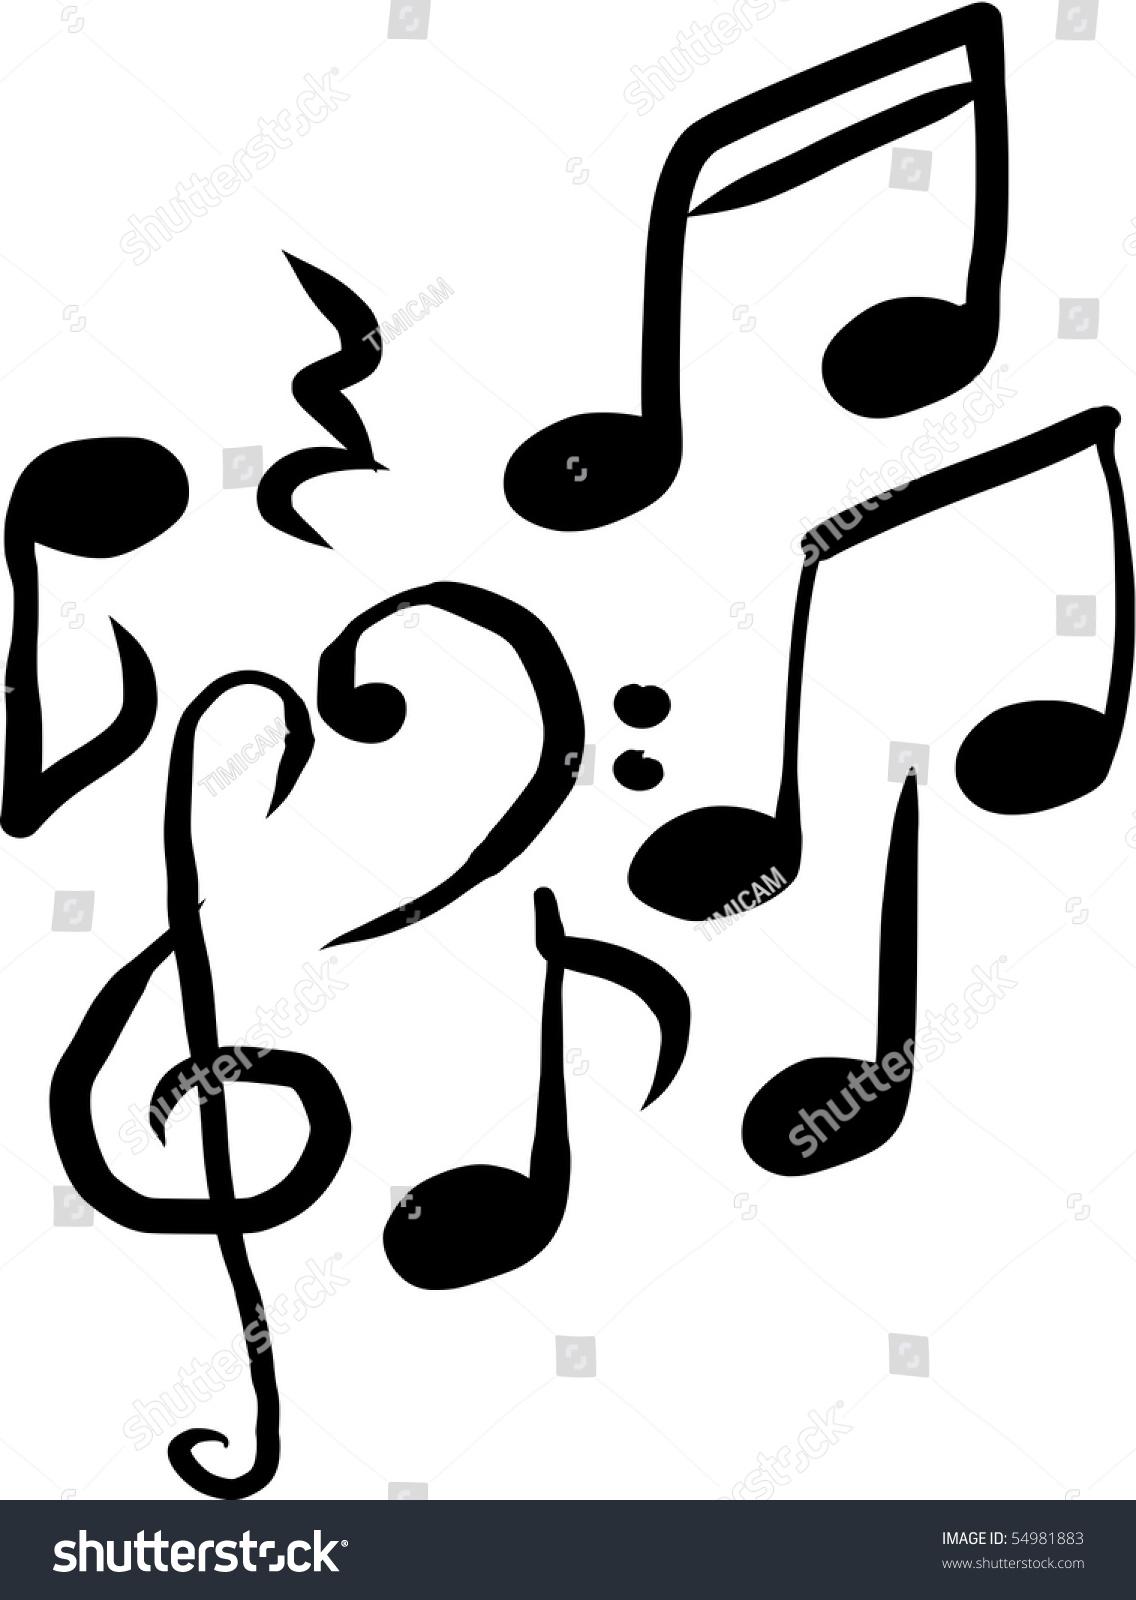 Musical notation symbols vector stock vector 54981883 shutterstock musical notation symbols vector biocorpaavc